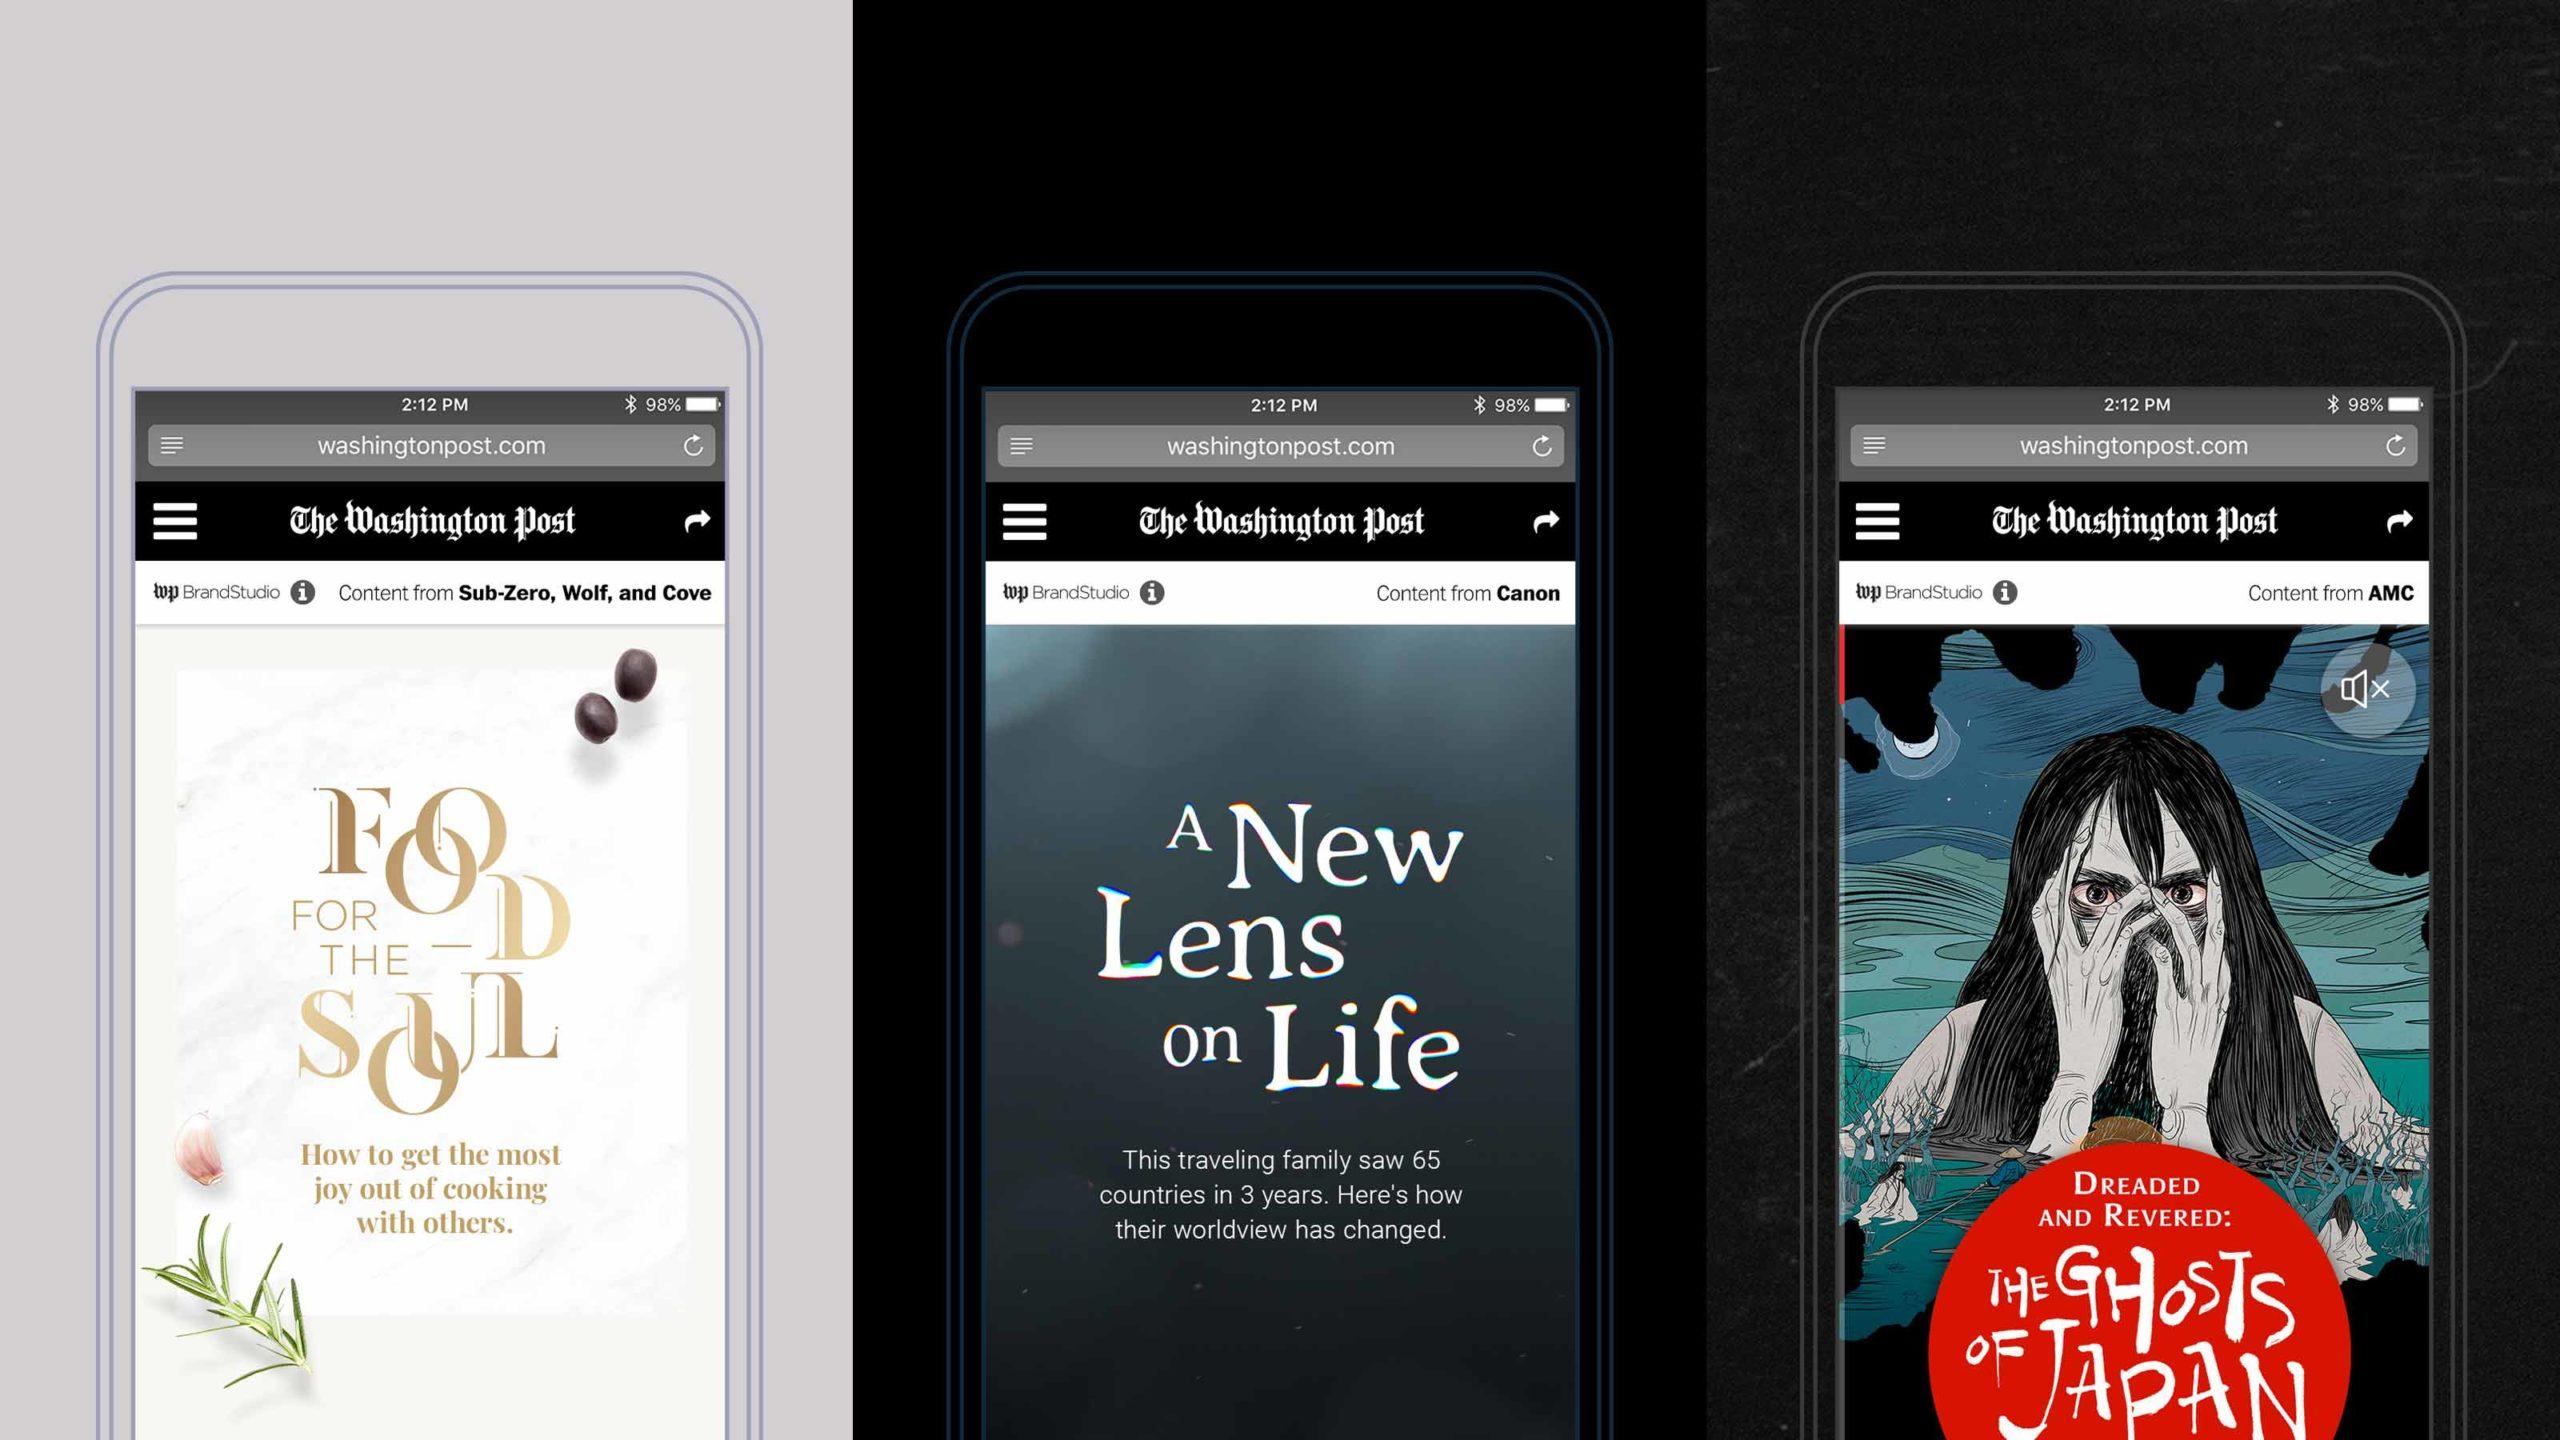 The Washington Post mobile application